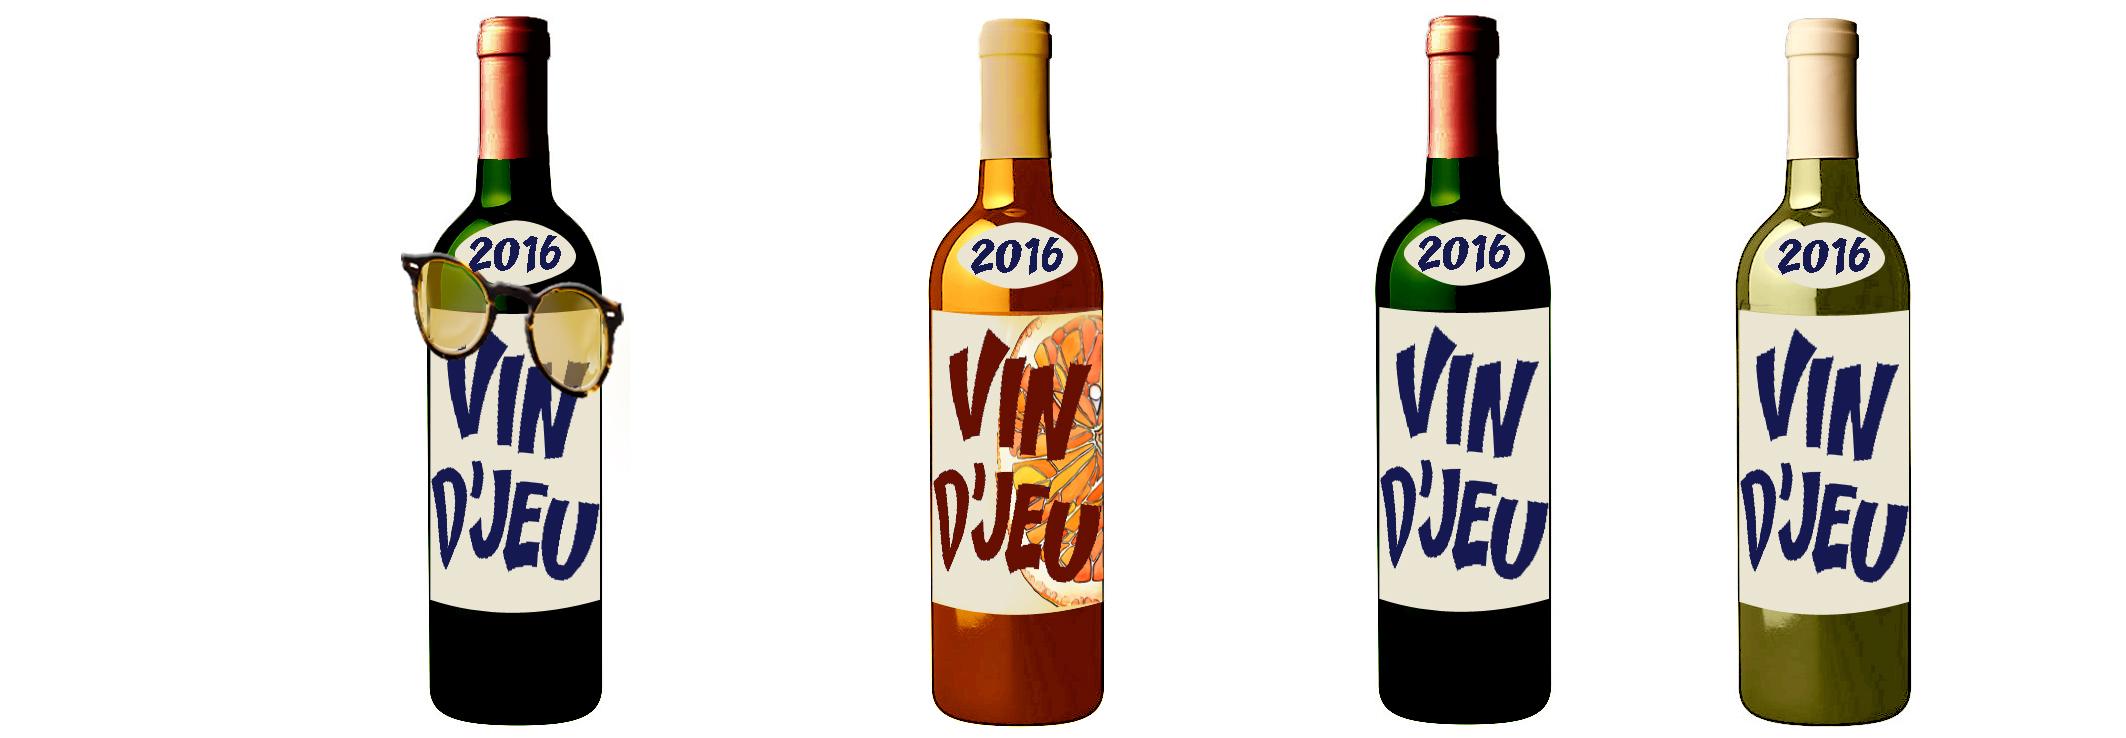 4 bouteilles vin djeu 2016